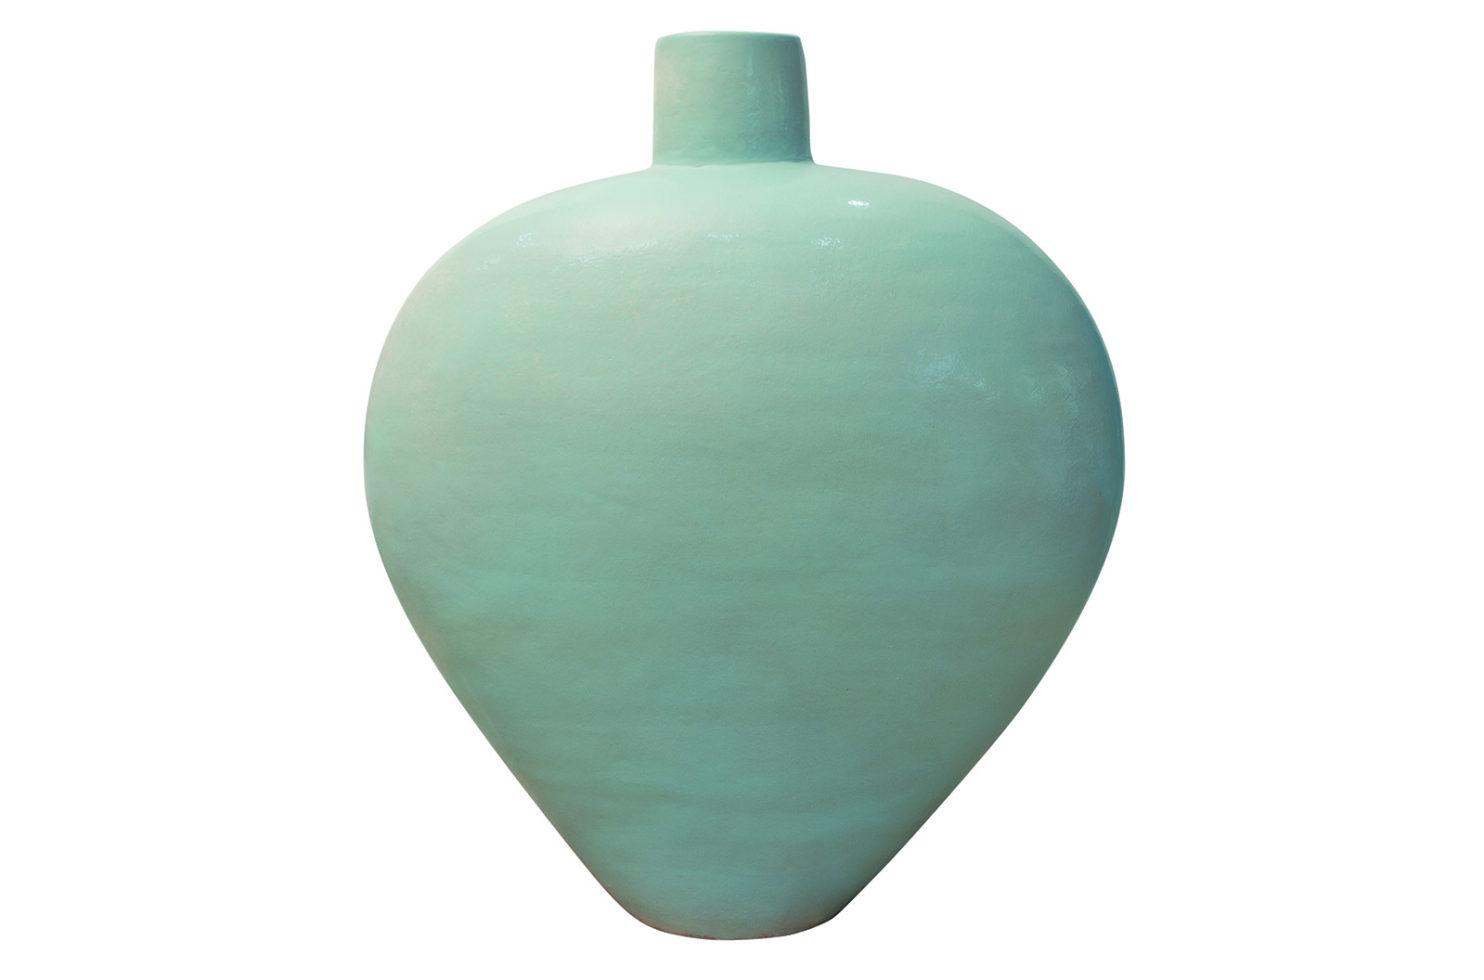 Vases Elliptical 308GU374P2MMG 2